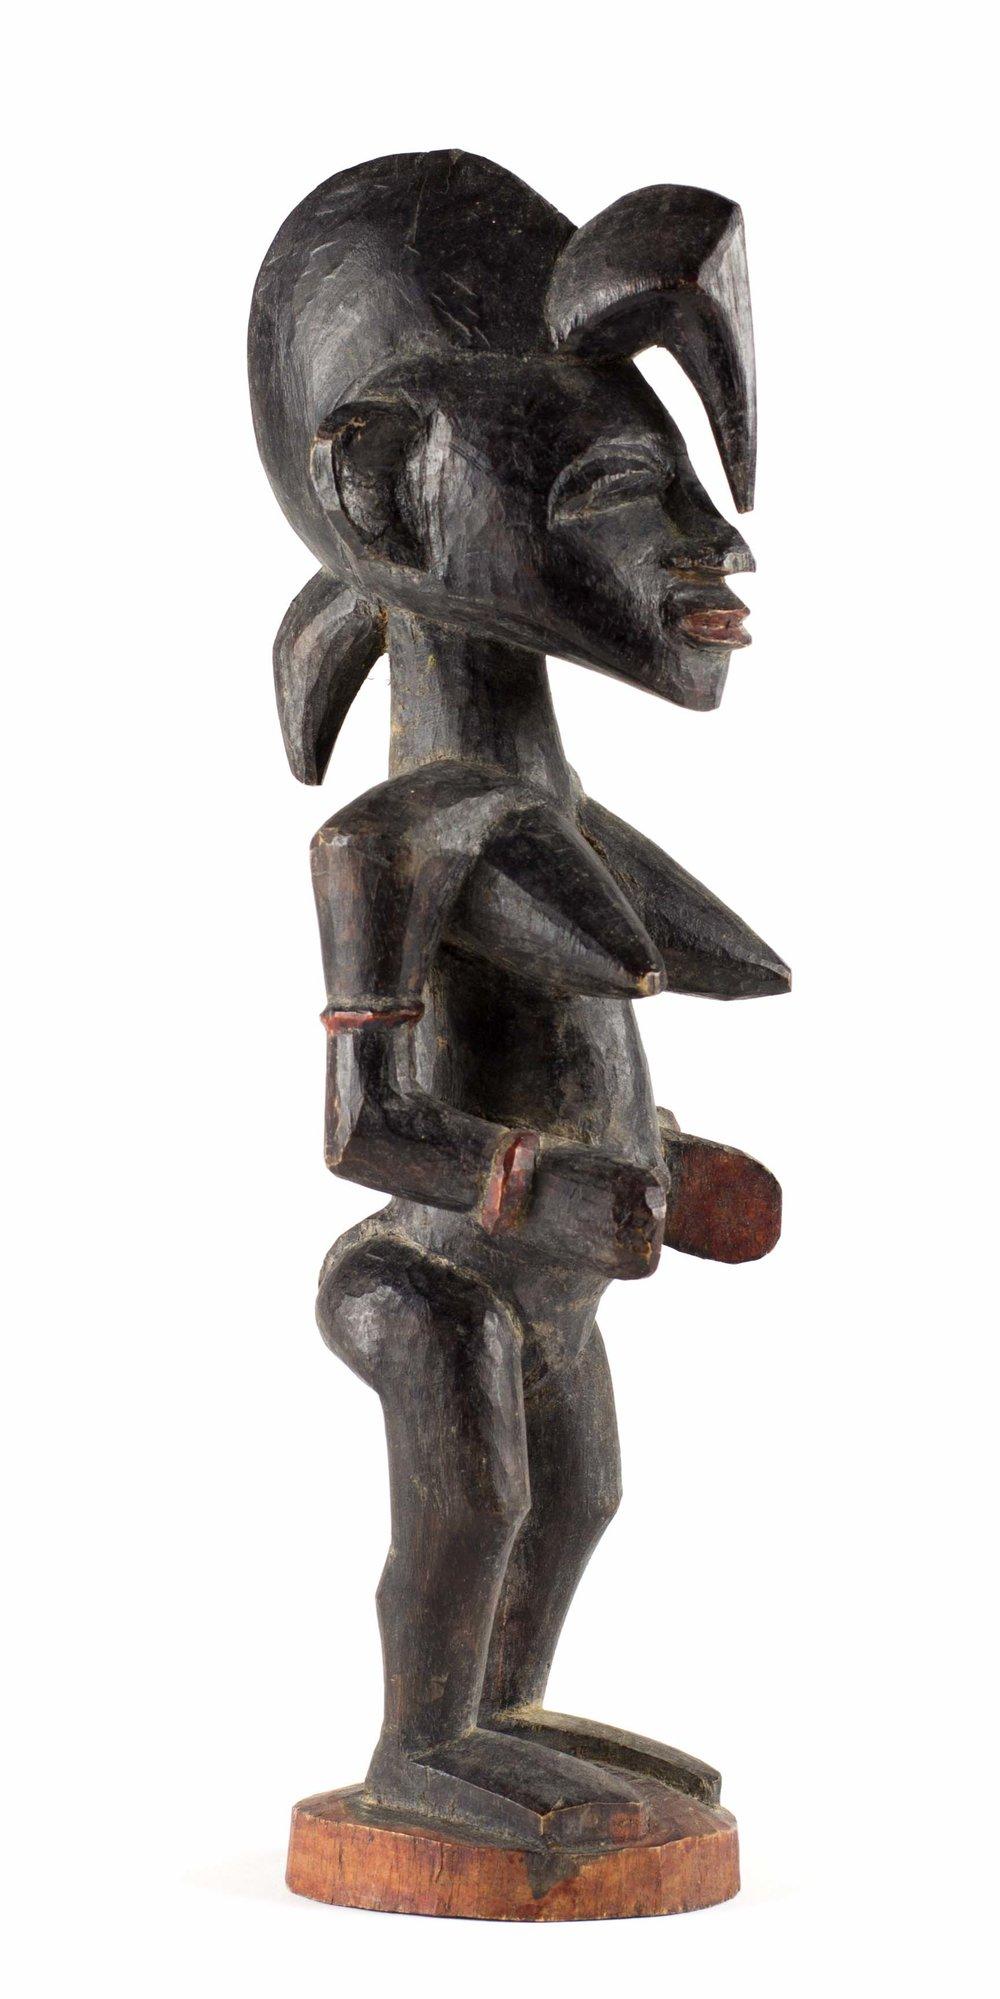 - Female figureKarna OuattaraNafoun (Region of Boundiali, Côte d'Ivoire)Carved for Karl-Heinz Krieg in 1975Wood, H. 26 cm